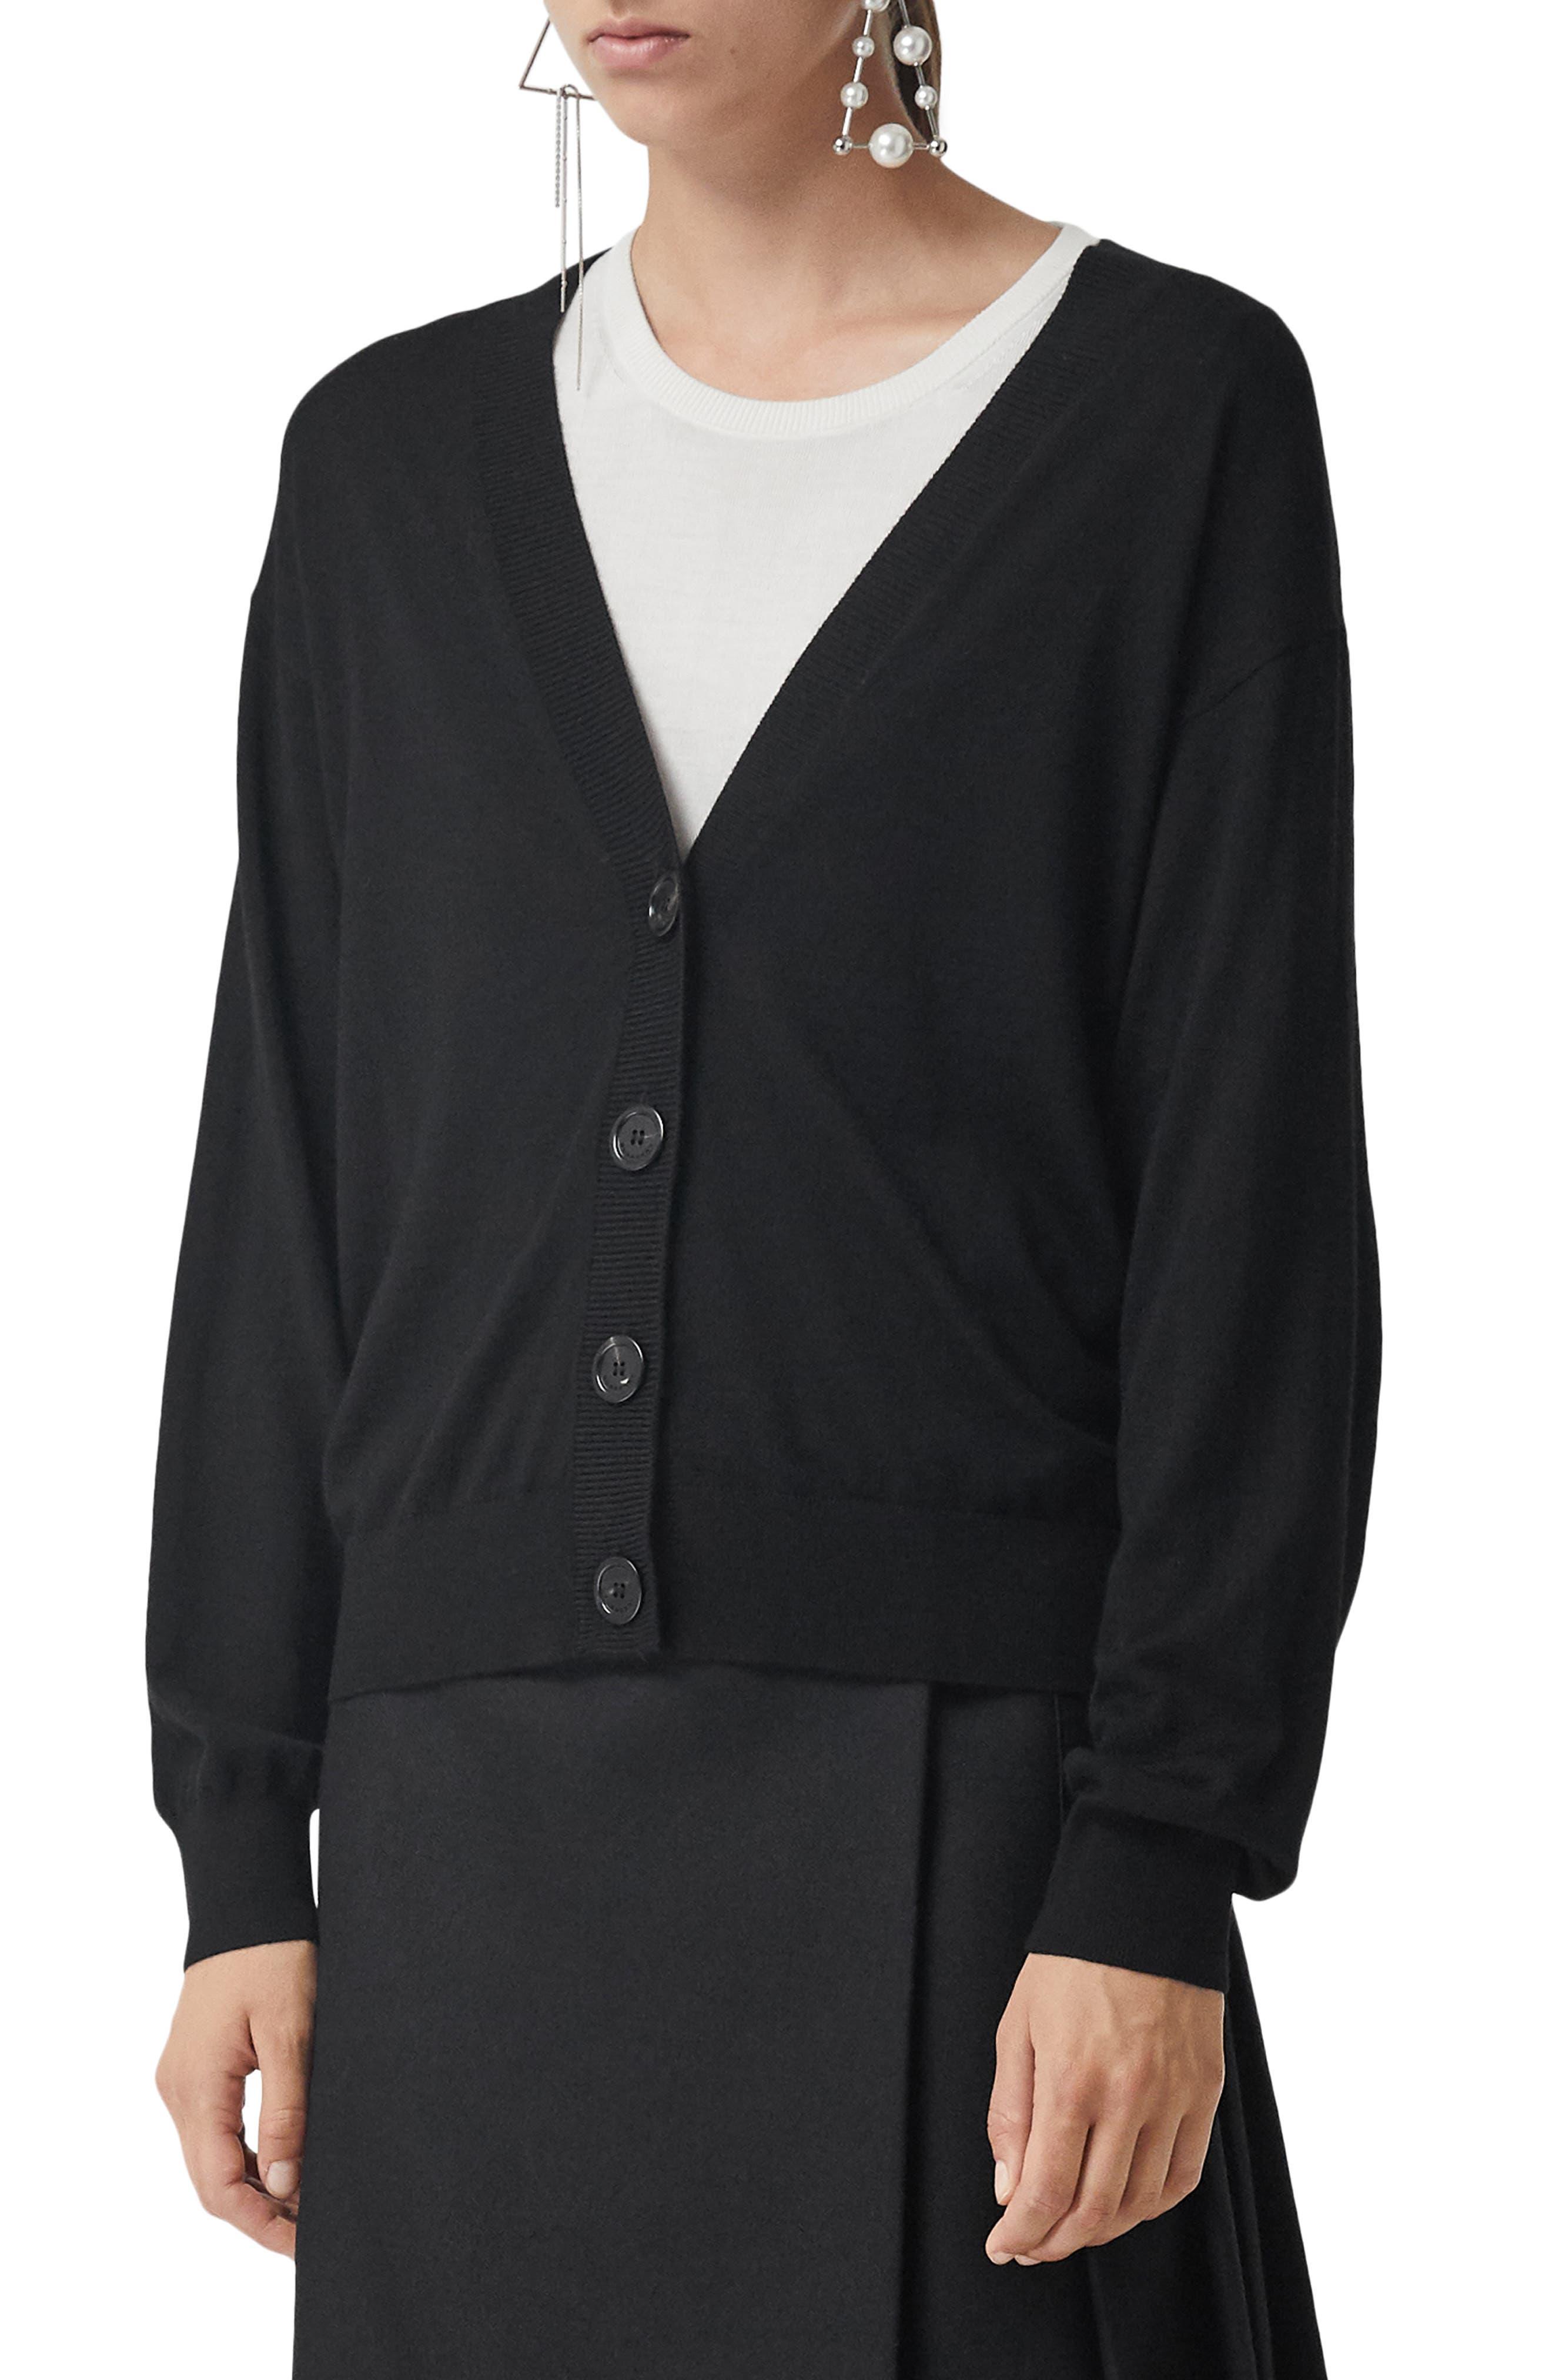 Burberry Dornoch Check Detail Merino Wool Cardigan, Black